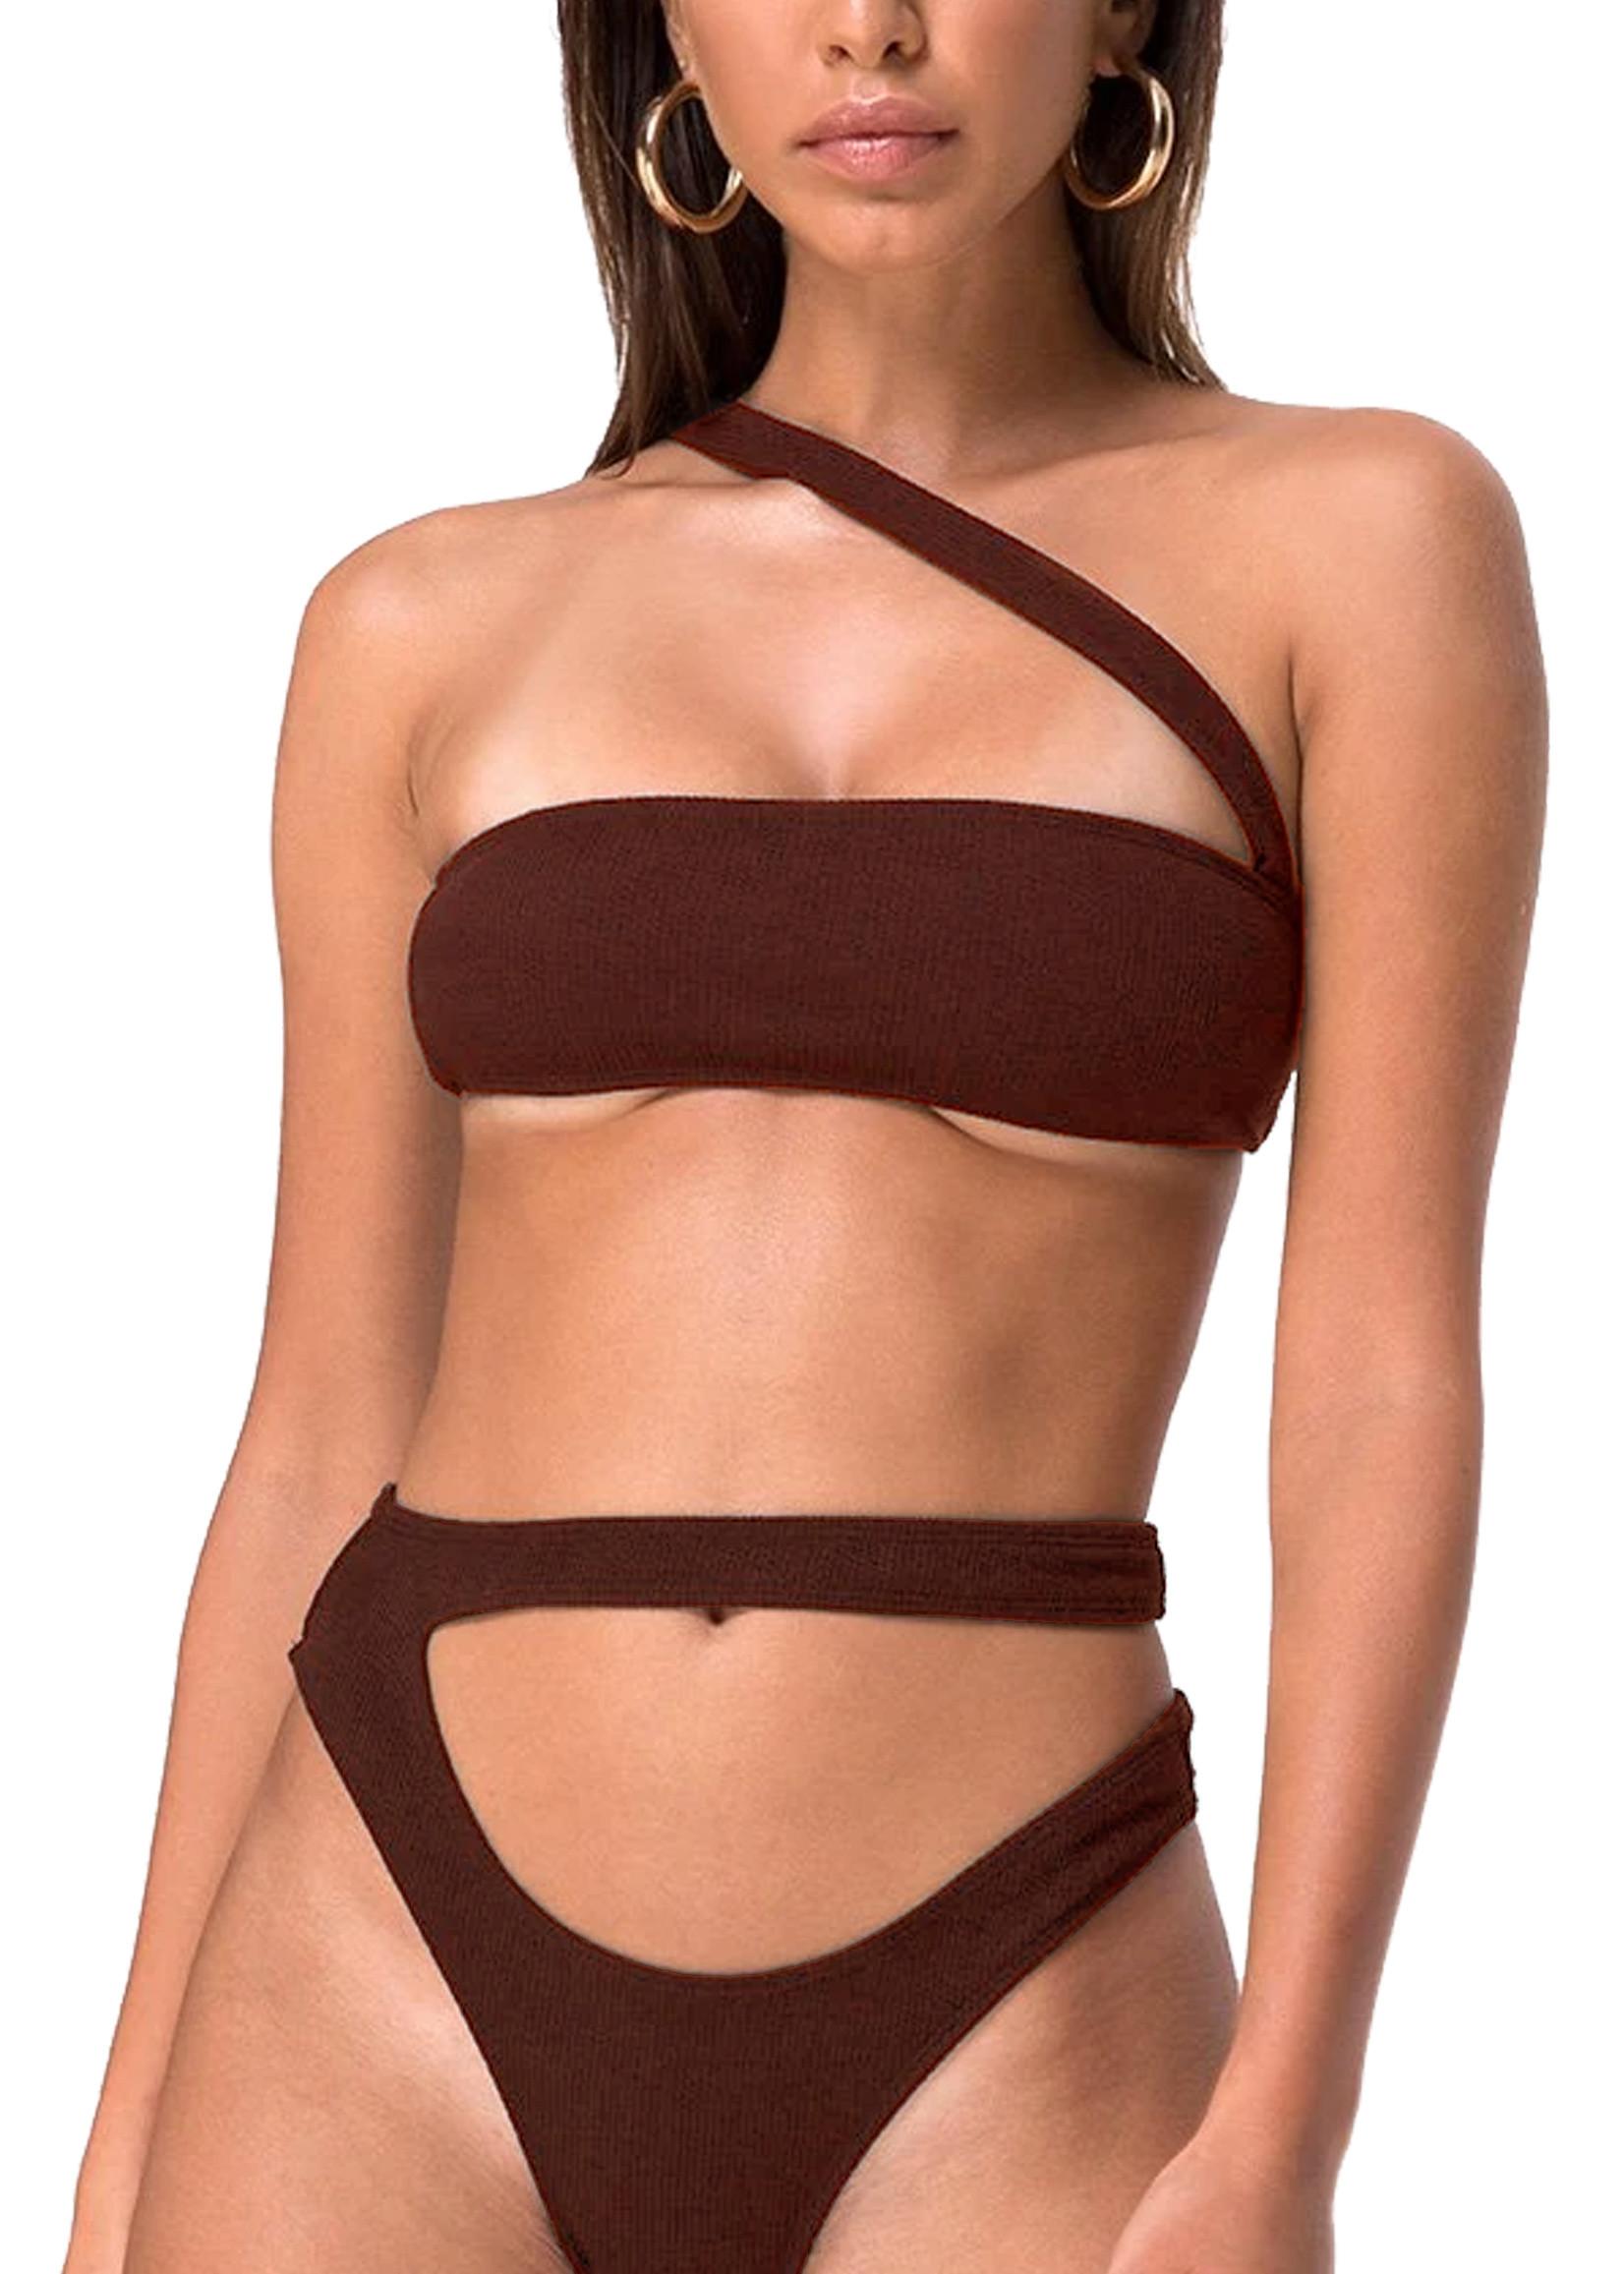 MOTEL MOTEL / Bound Bikini Top